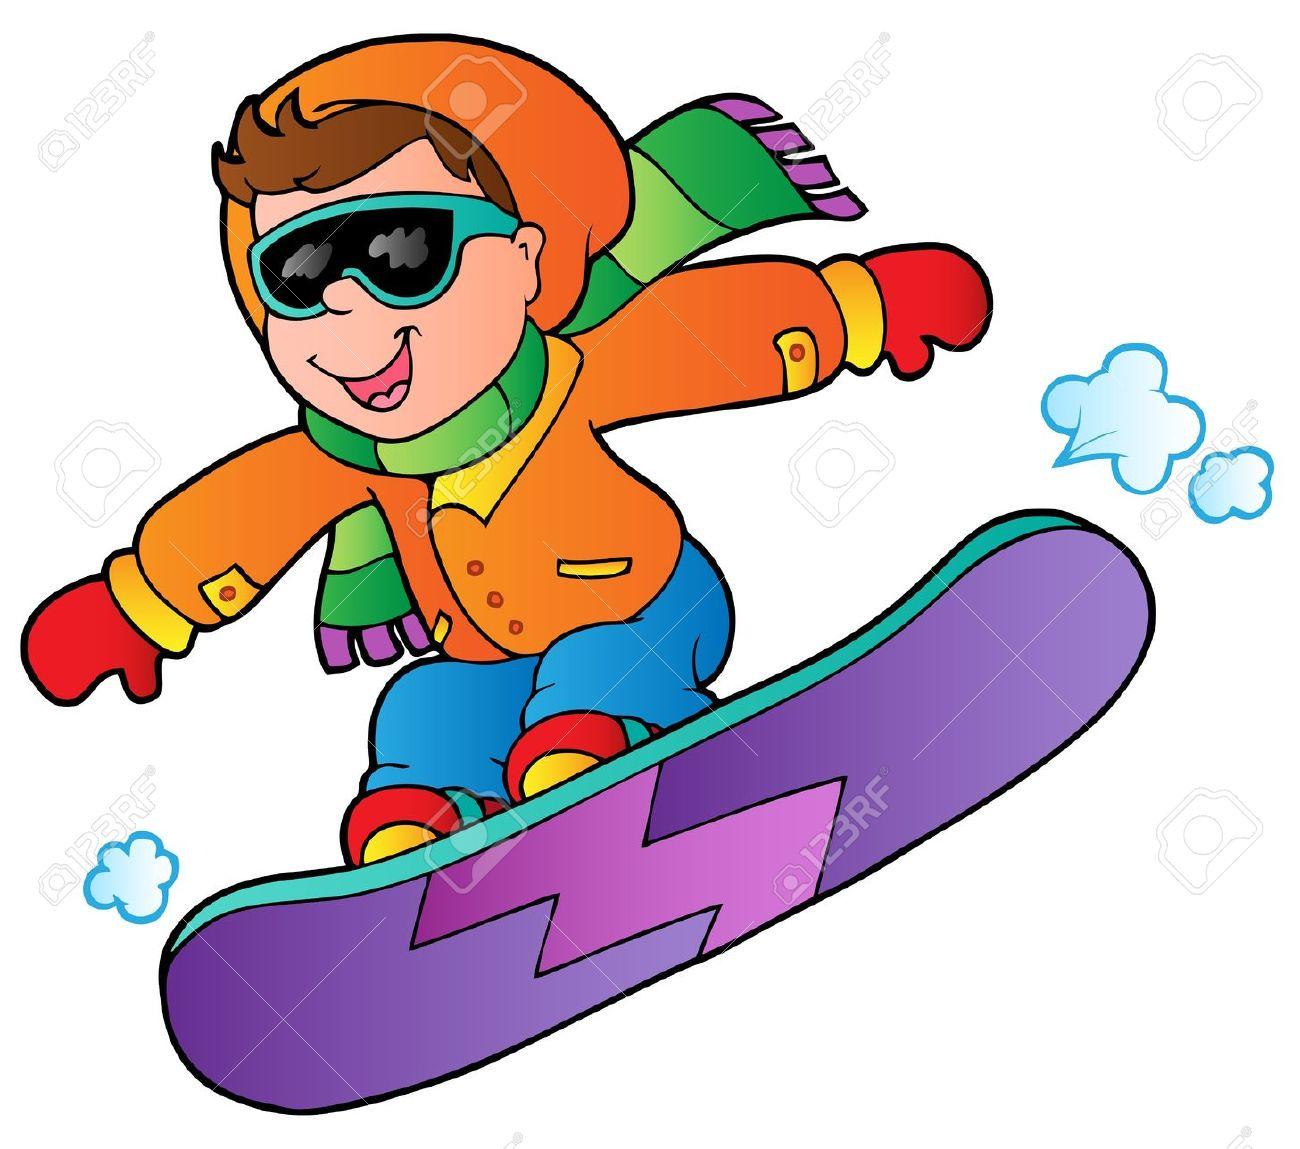 120 Snowboard Clipart.